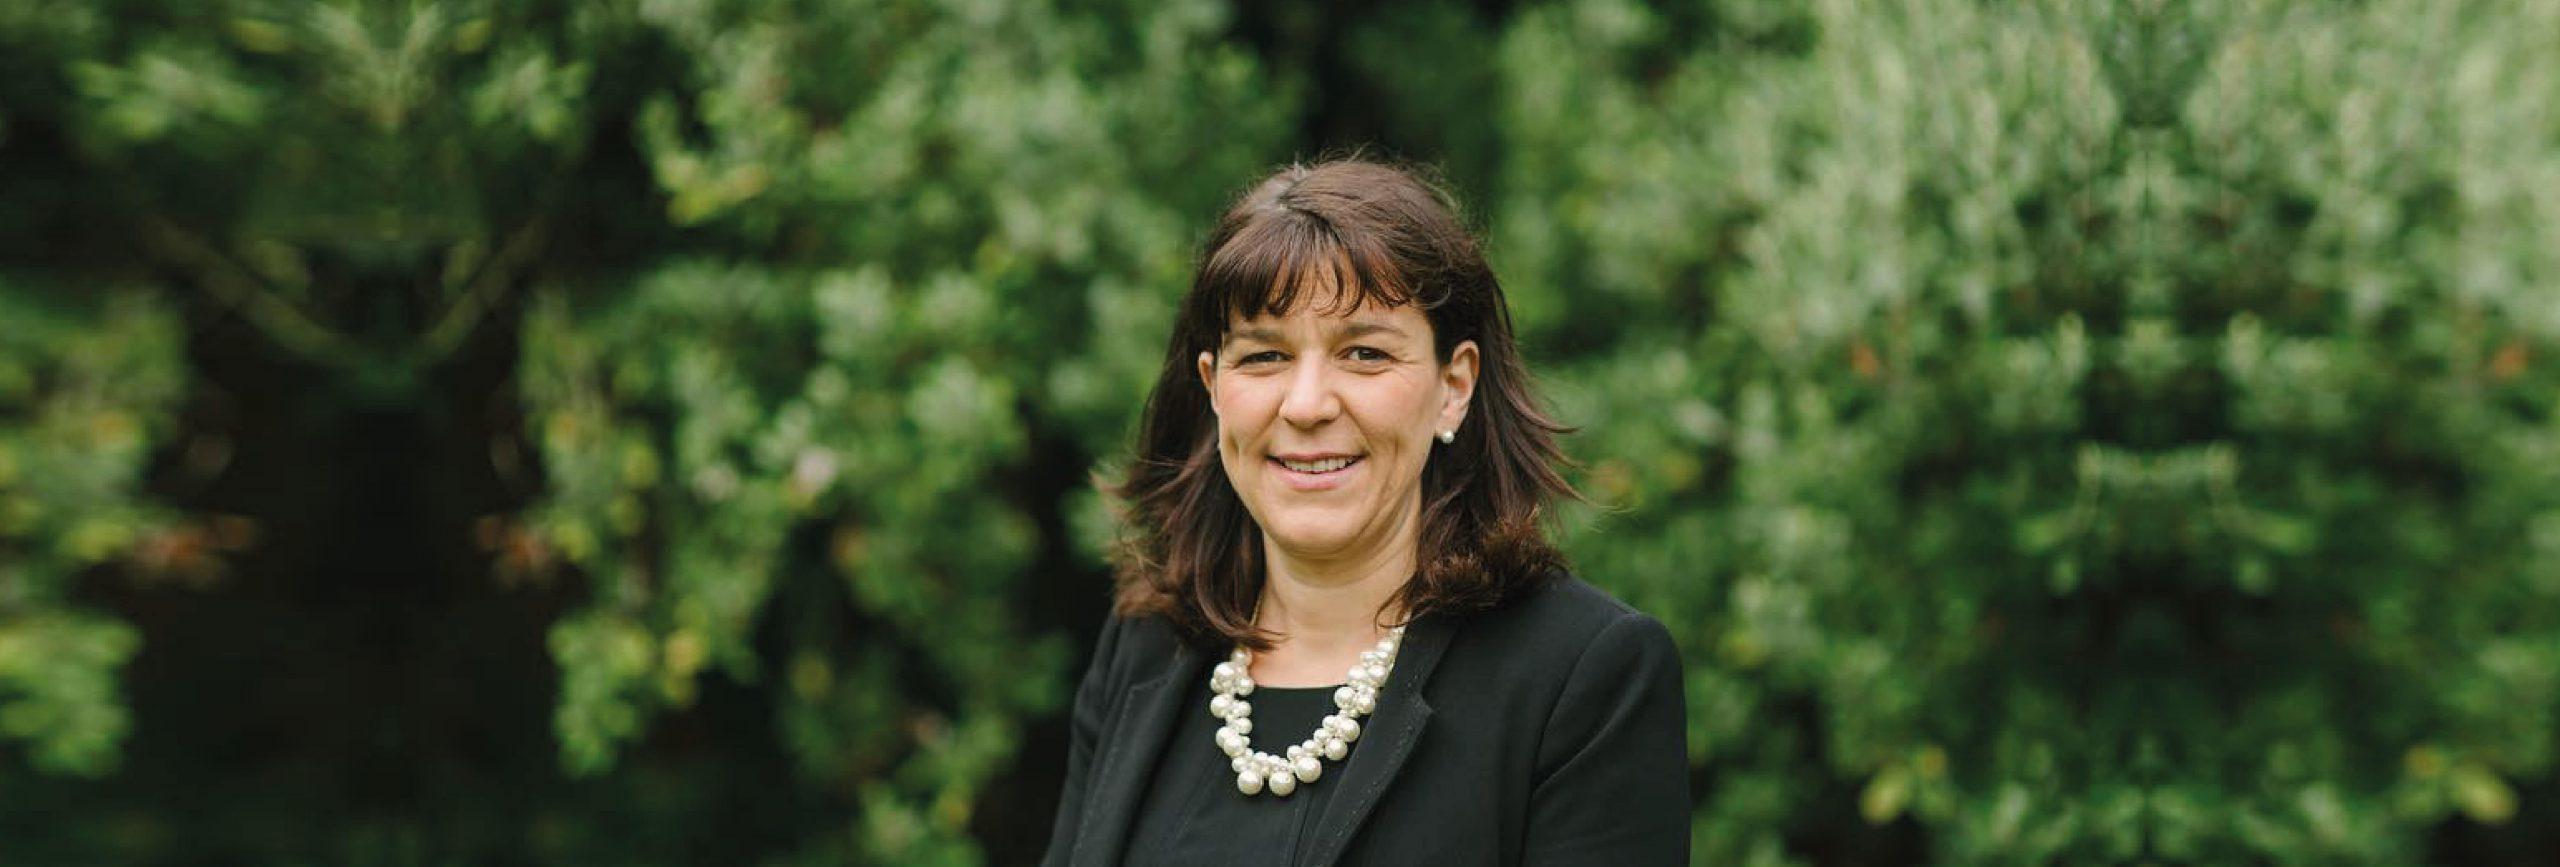 Sarah Chamberlain - A qualified Chartered Accountant